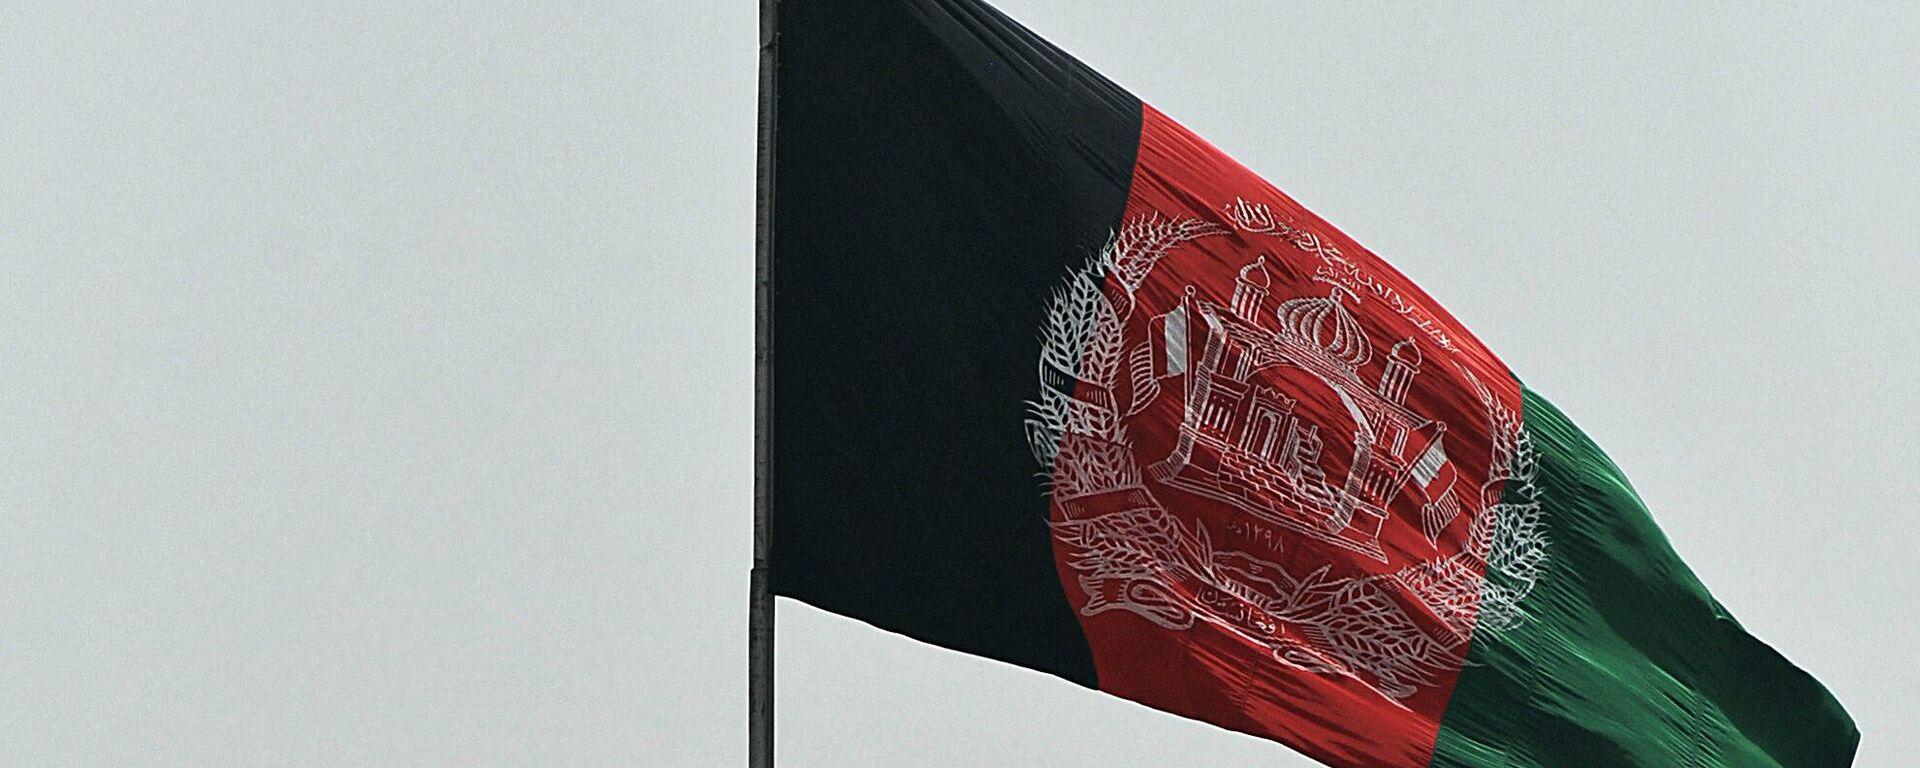 Флаг Афганистана  - Sputnik Ўзбекистон, 1920, 12.07.2021